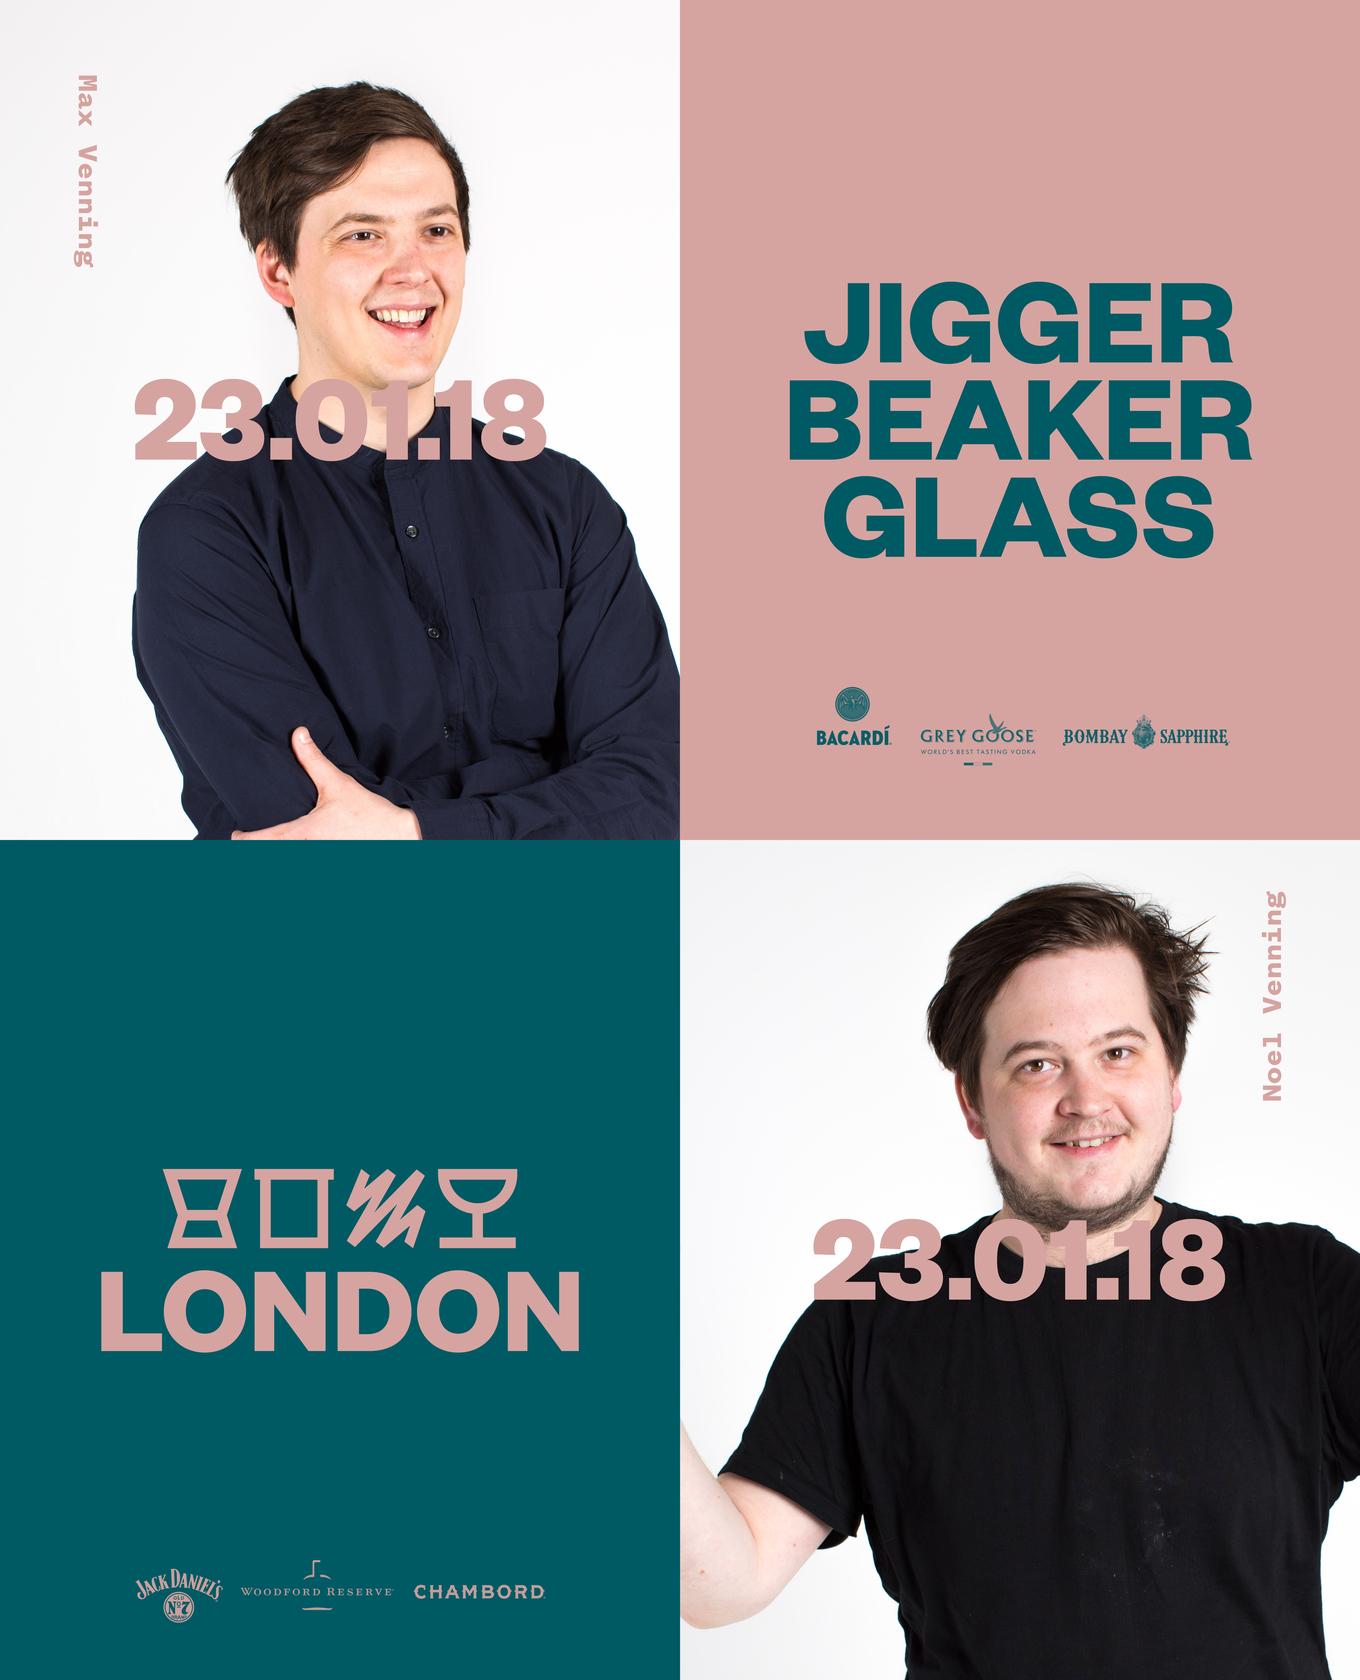 Jigger Beaker & Glass with Erik & Ice image 1